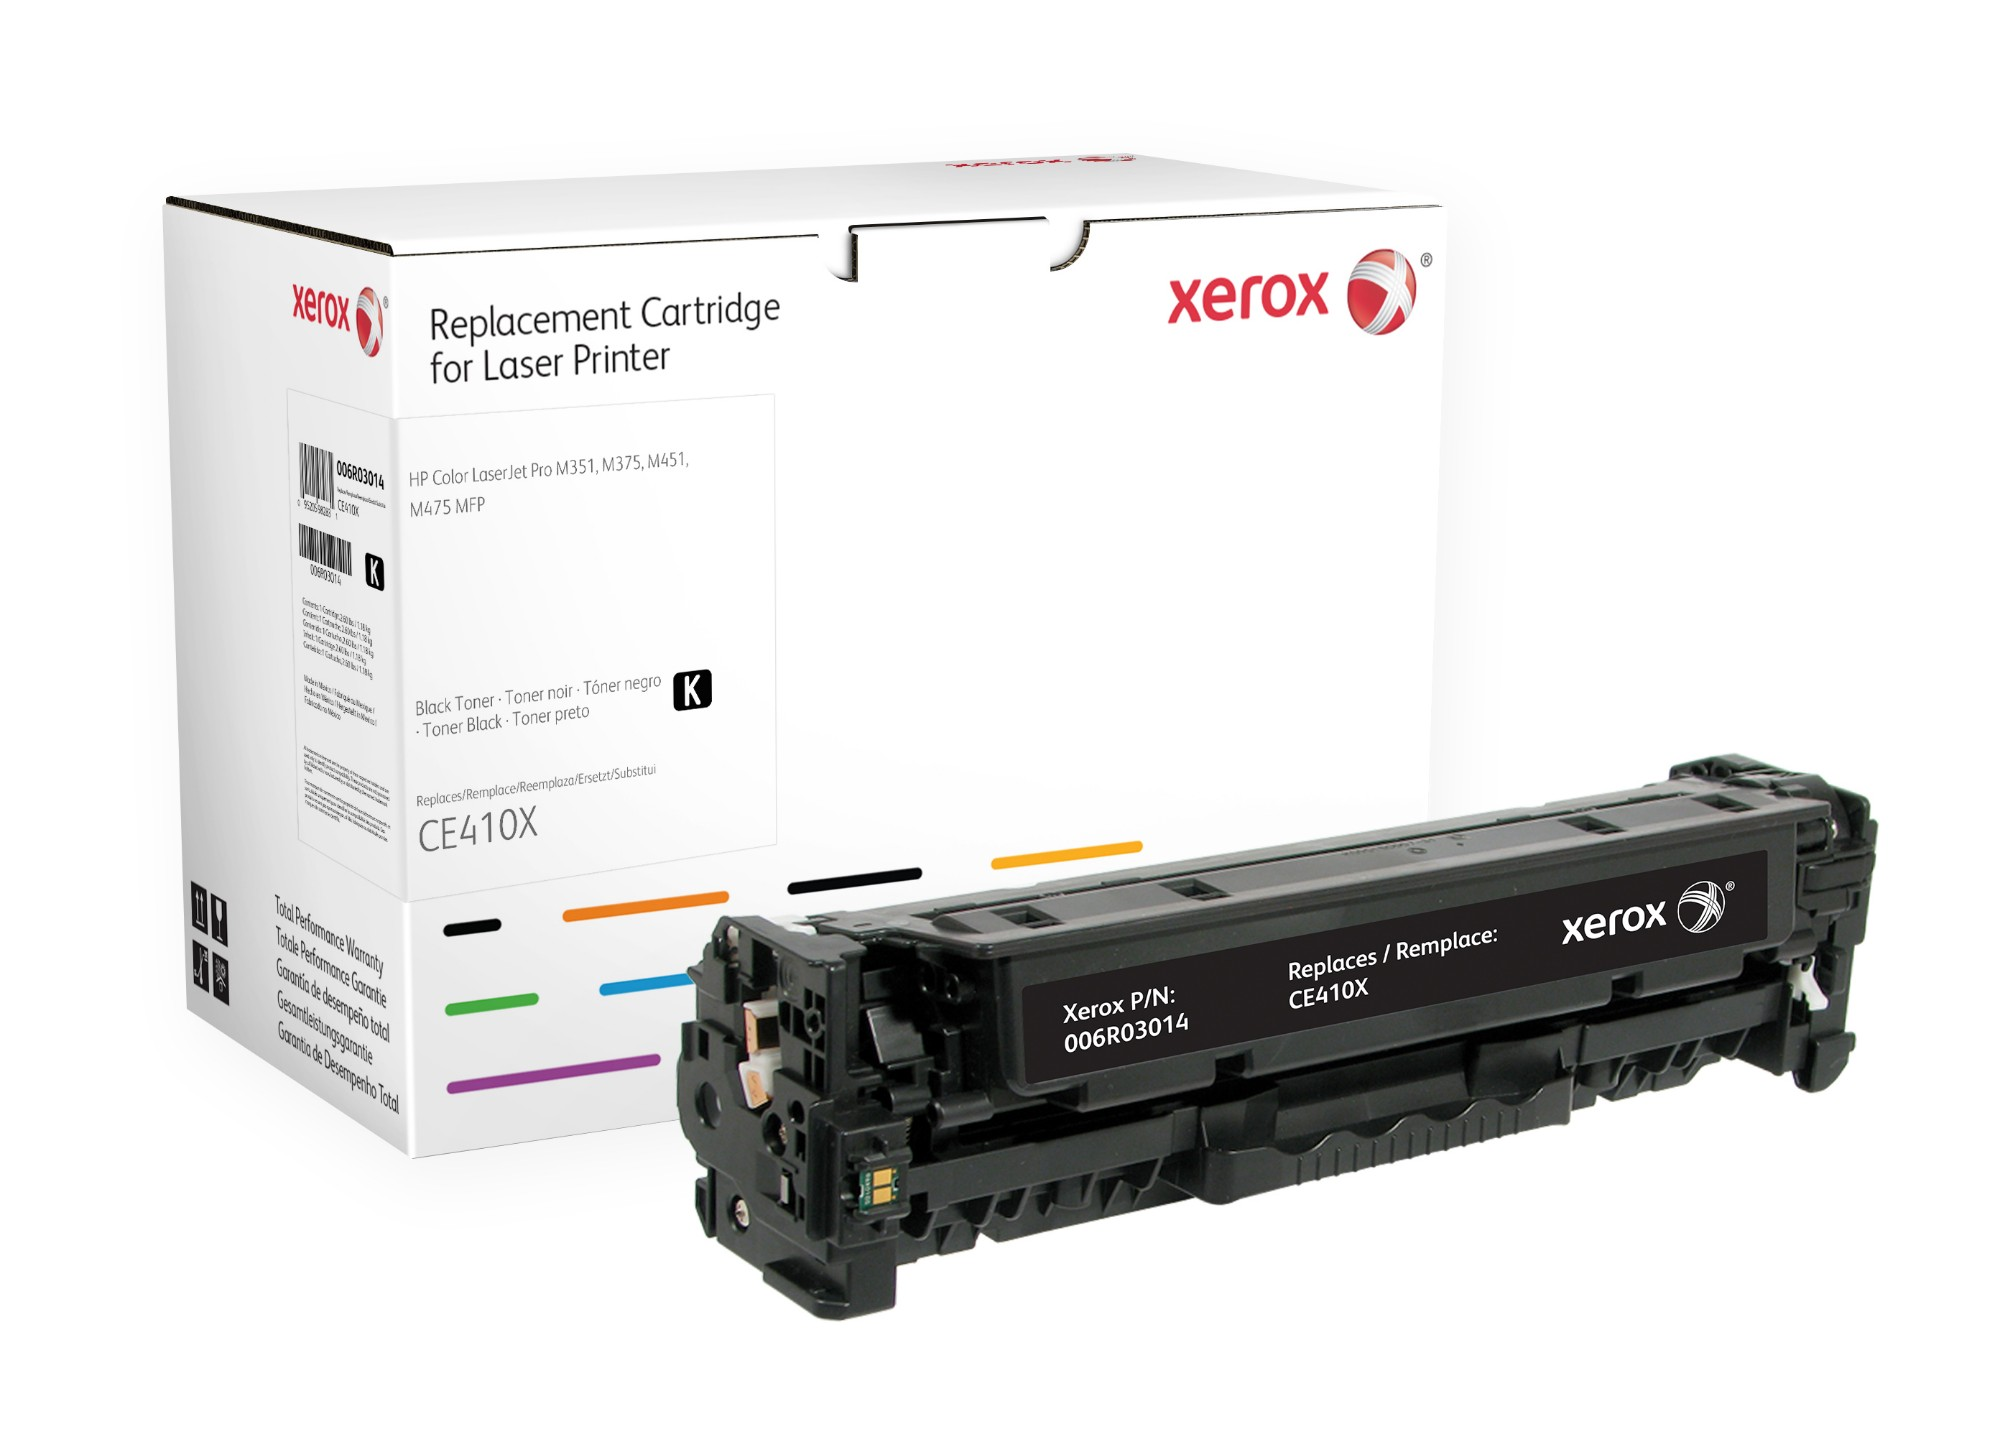 Xerox Cartucho de tóner negro. Equivalente a HP CE410X. Compatible con HP Colour LaserJet M351A, Colour LaserJet M375MFP, Colour LaserJet M451, Colour LaserJet M475 MFP